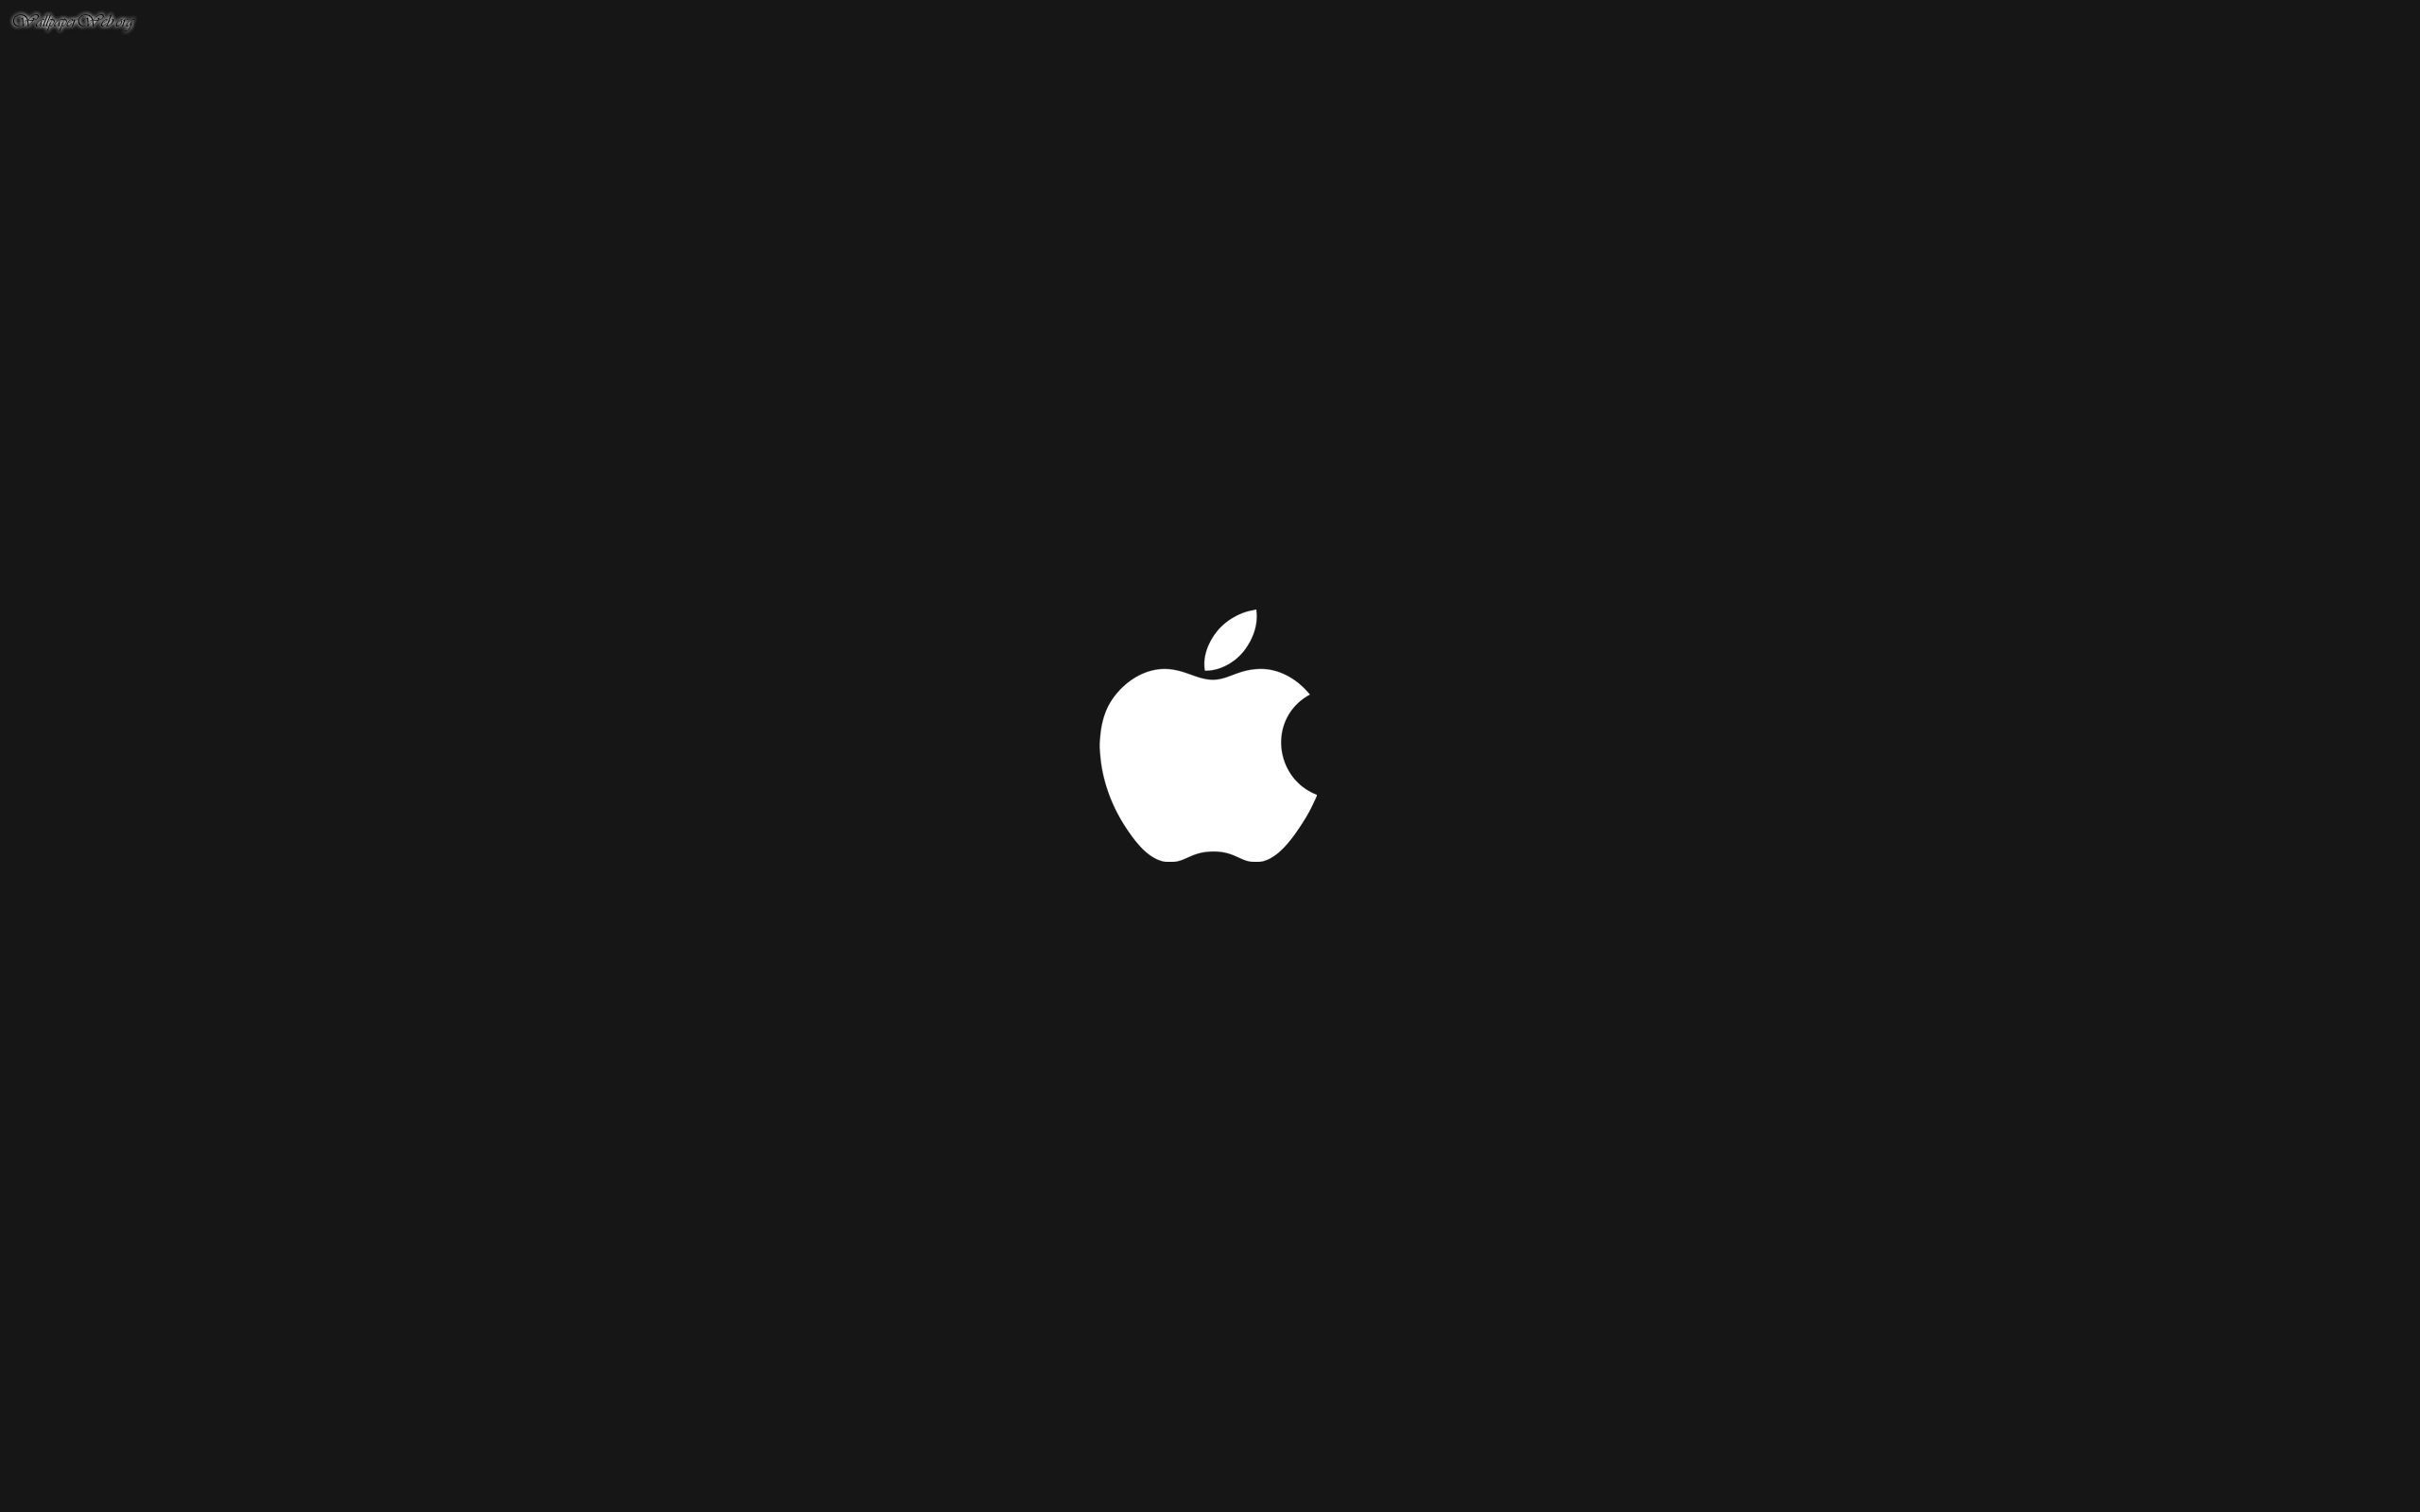 Computer Apple Logo black picture nr 27779 2560x1600